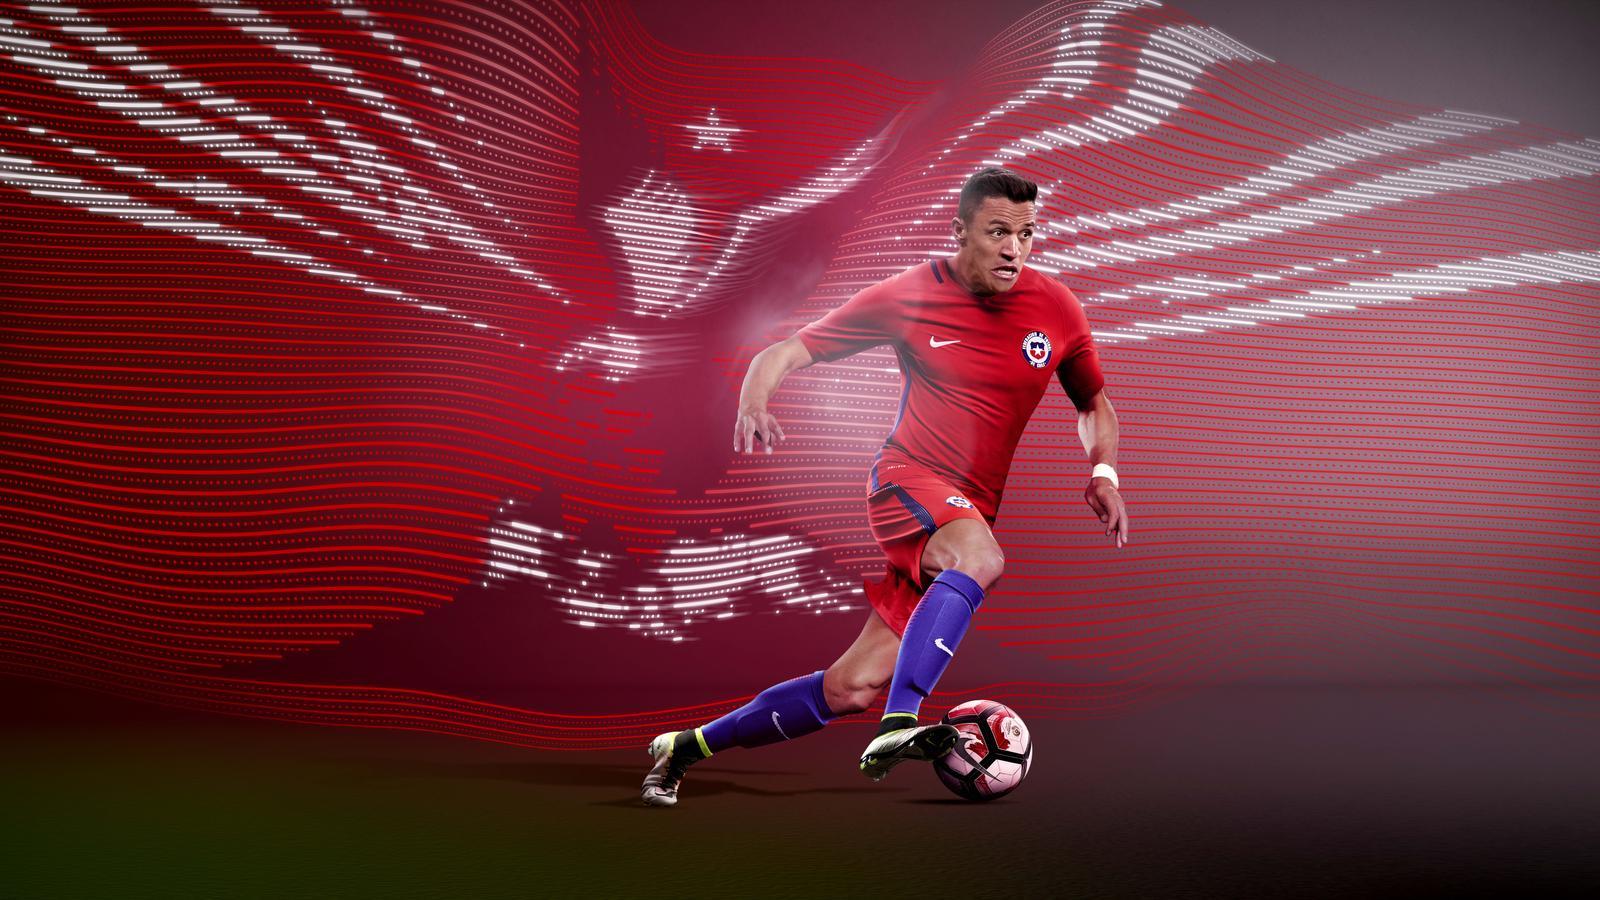 Chile 2016 National Football Kits